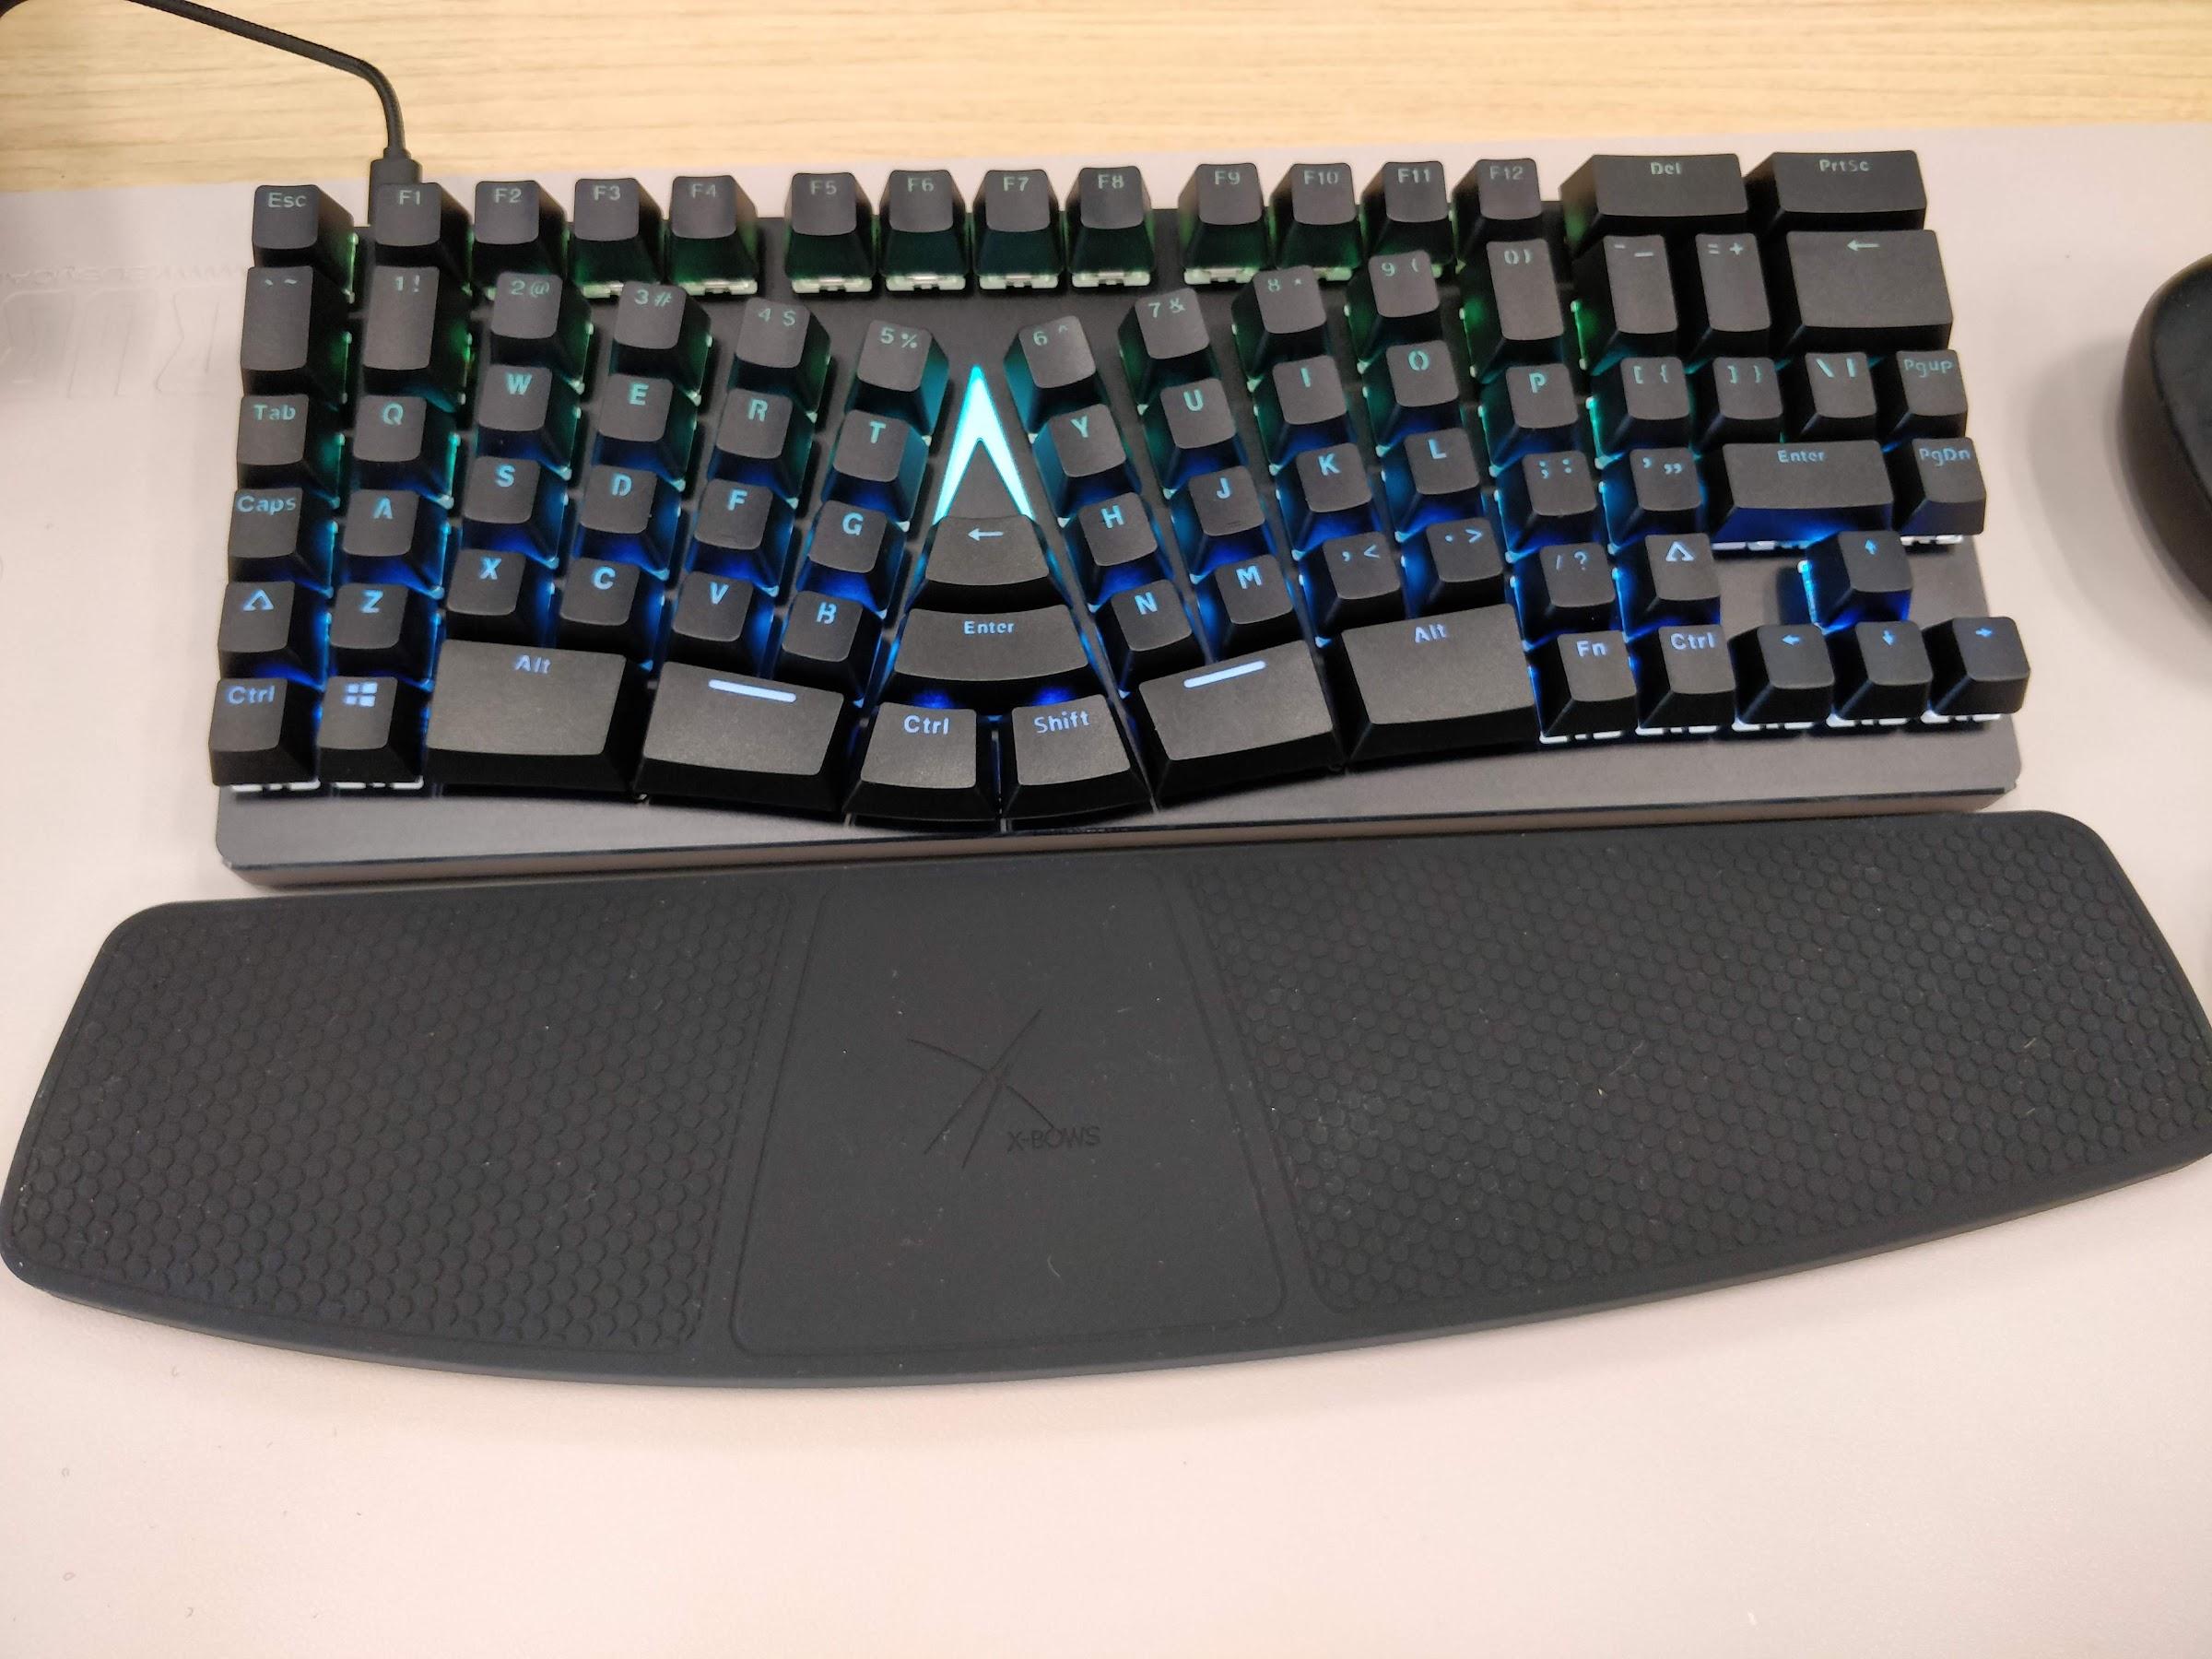 X-Bows Keyboard